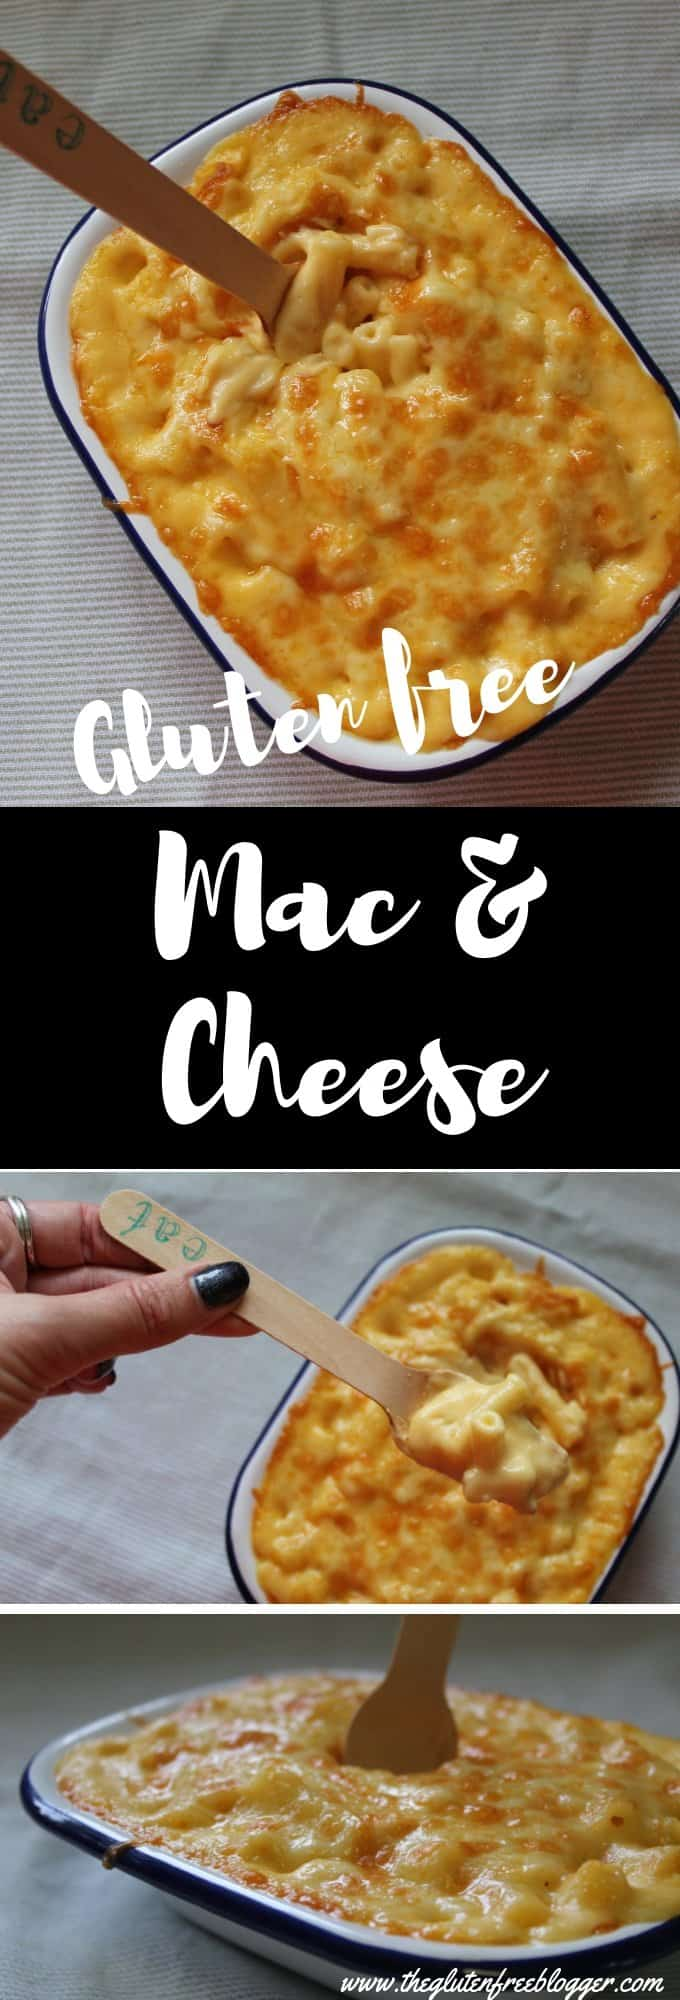 Gluten free mac and cheese - gluten free dinner - recipe ideas